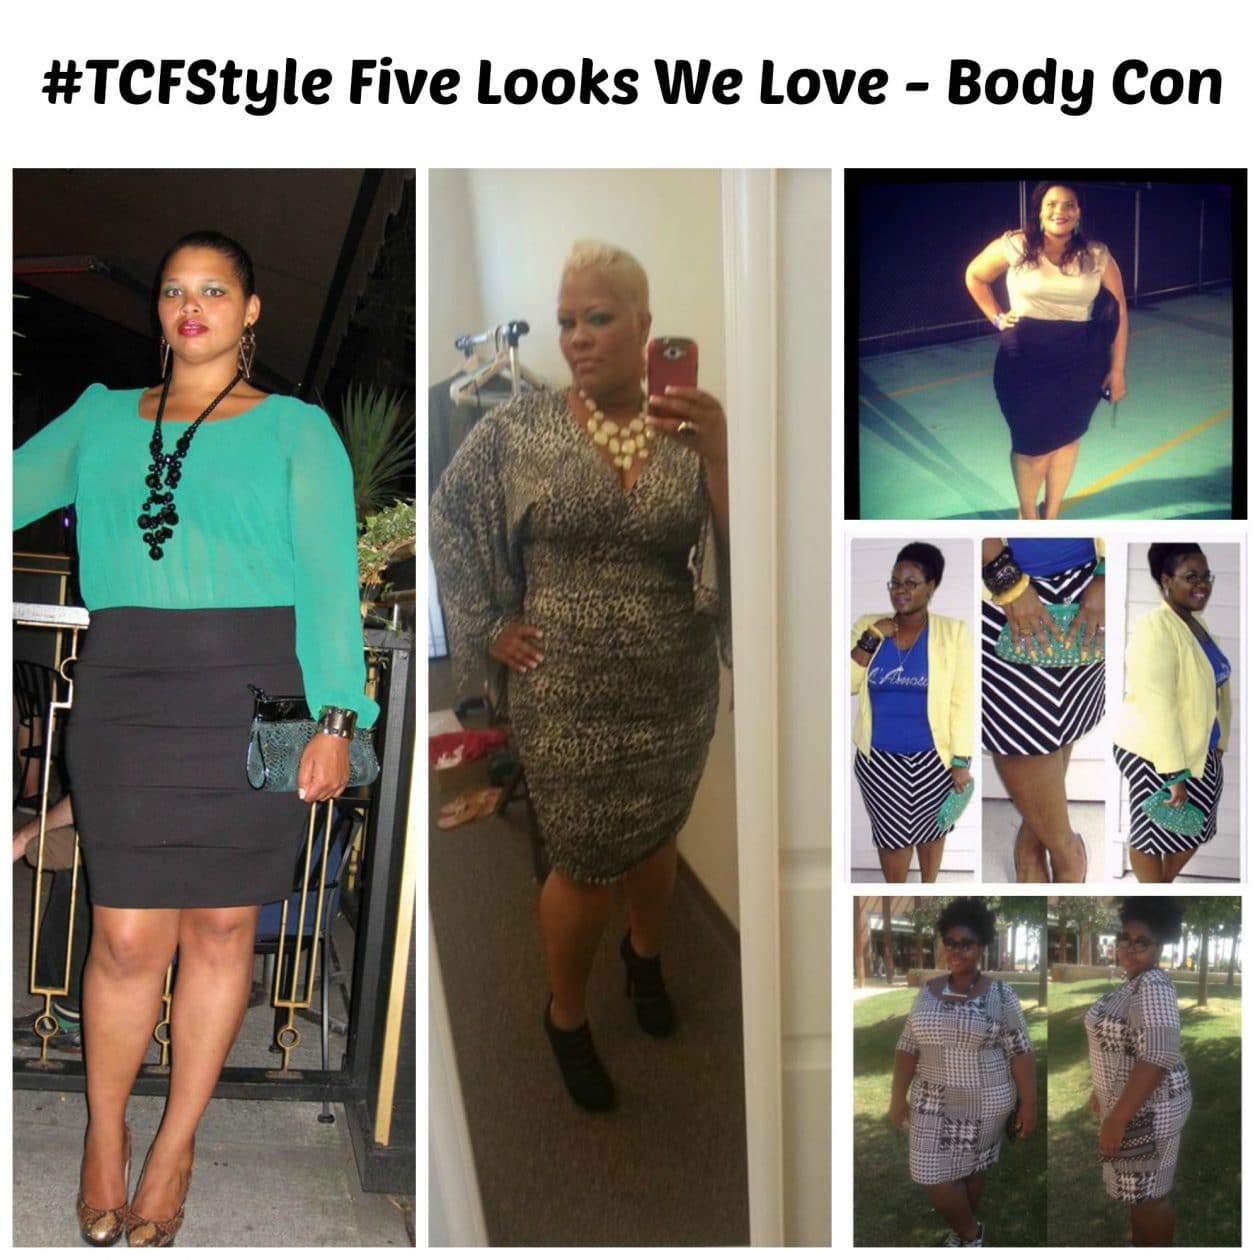 #tcfstyle body con